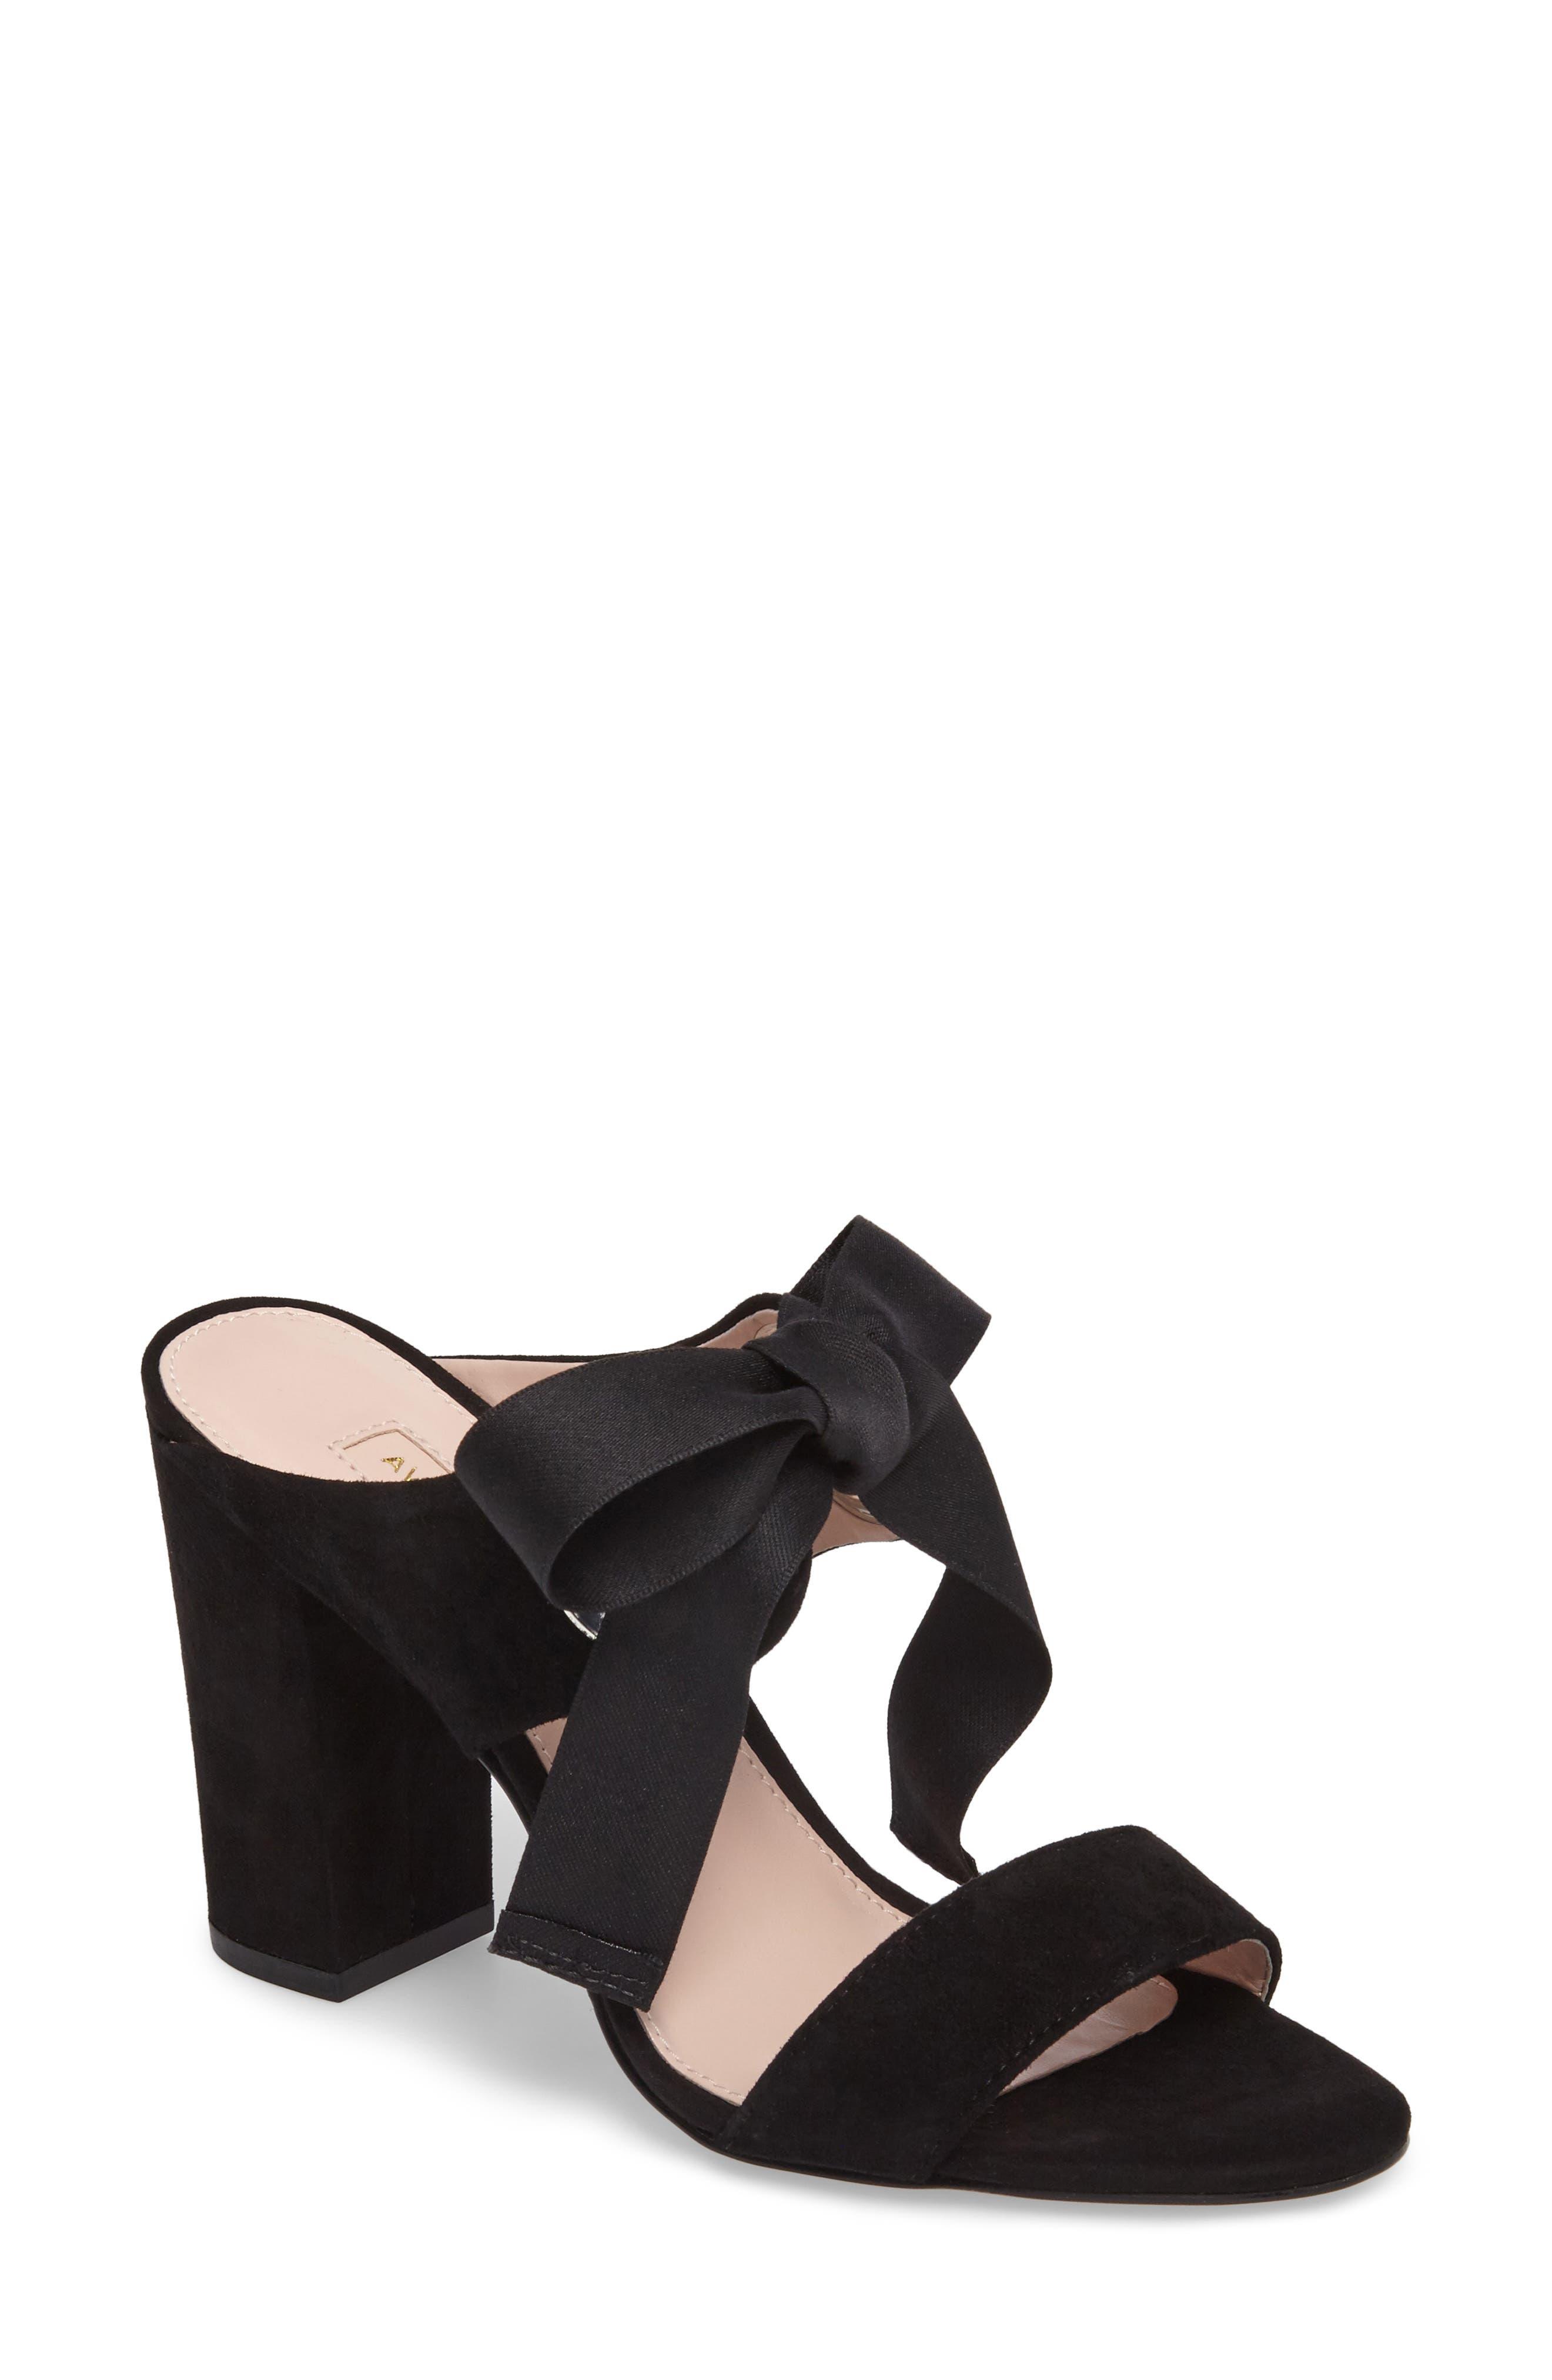 Megan Tie Strap Sandal,                         Main,                         color, Black Suede